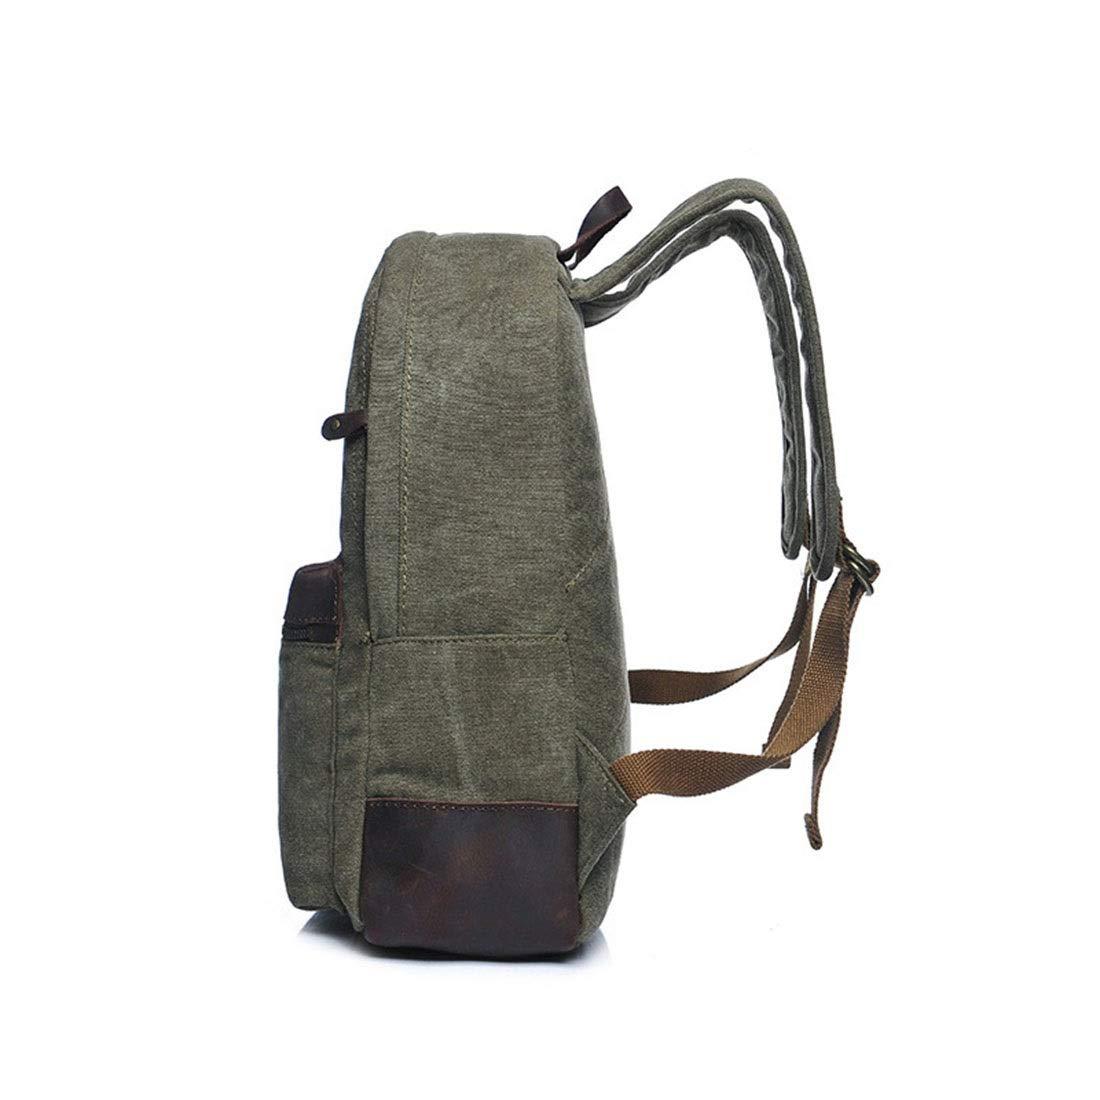 Ryggsäck män/kvinnor ryggsäck dagväska vattentät dragkedja vintage kanvas student axelväska utomhus shopping män ryggsäck (färg: grå) Armégrön